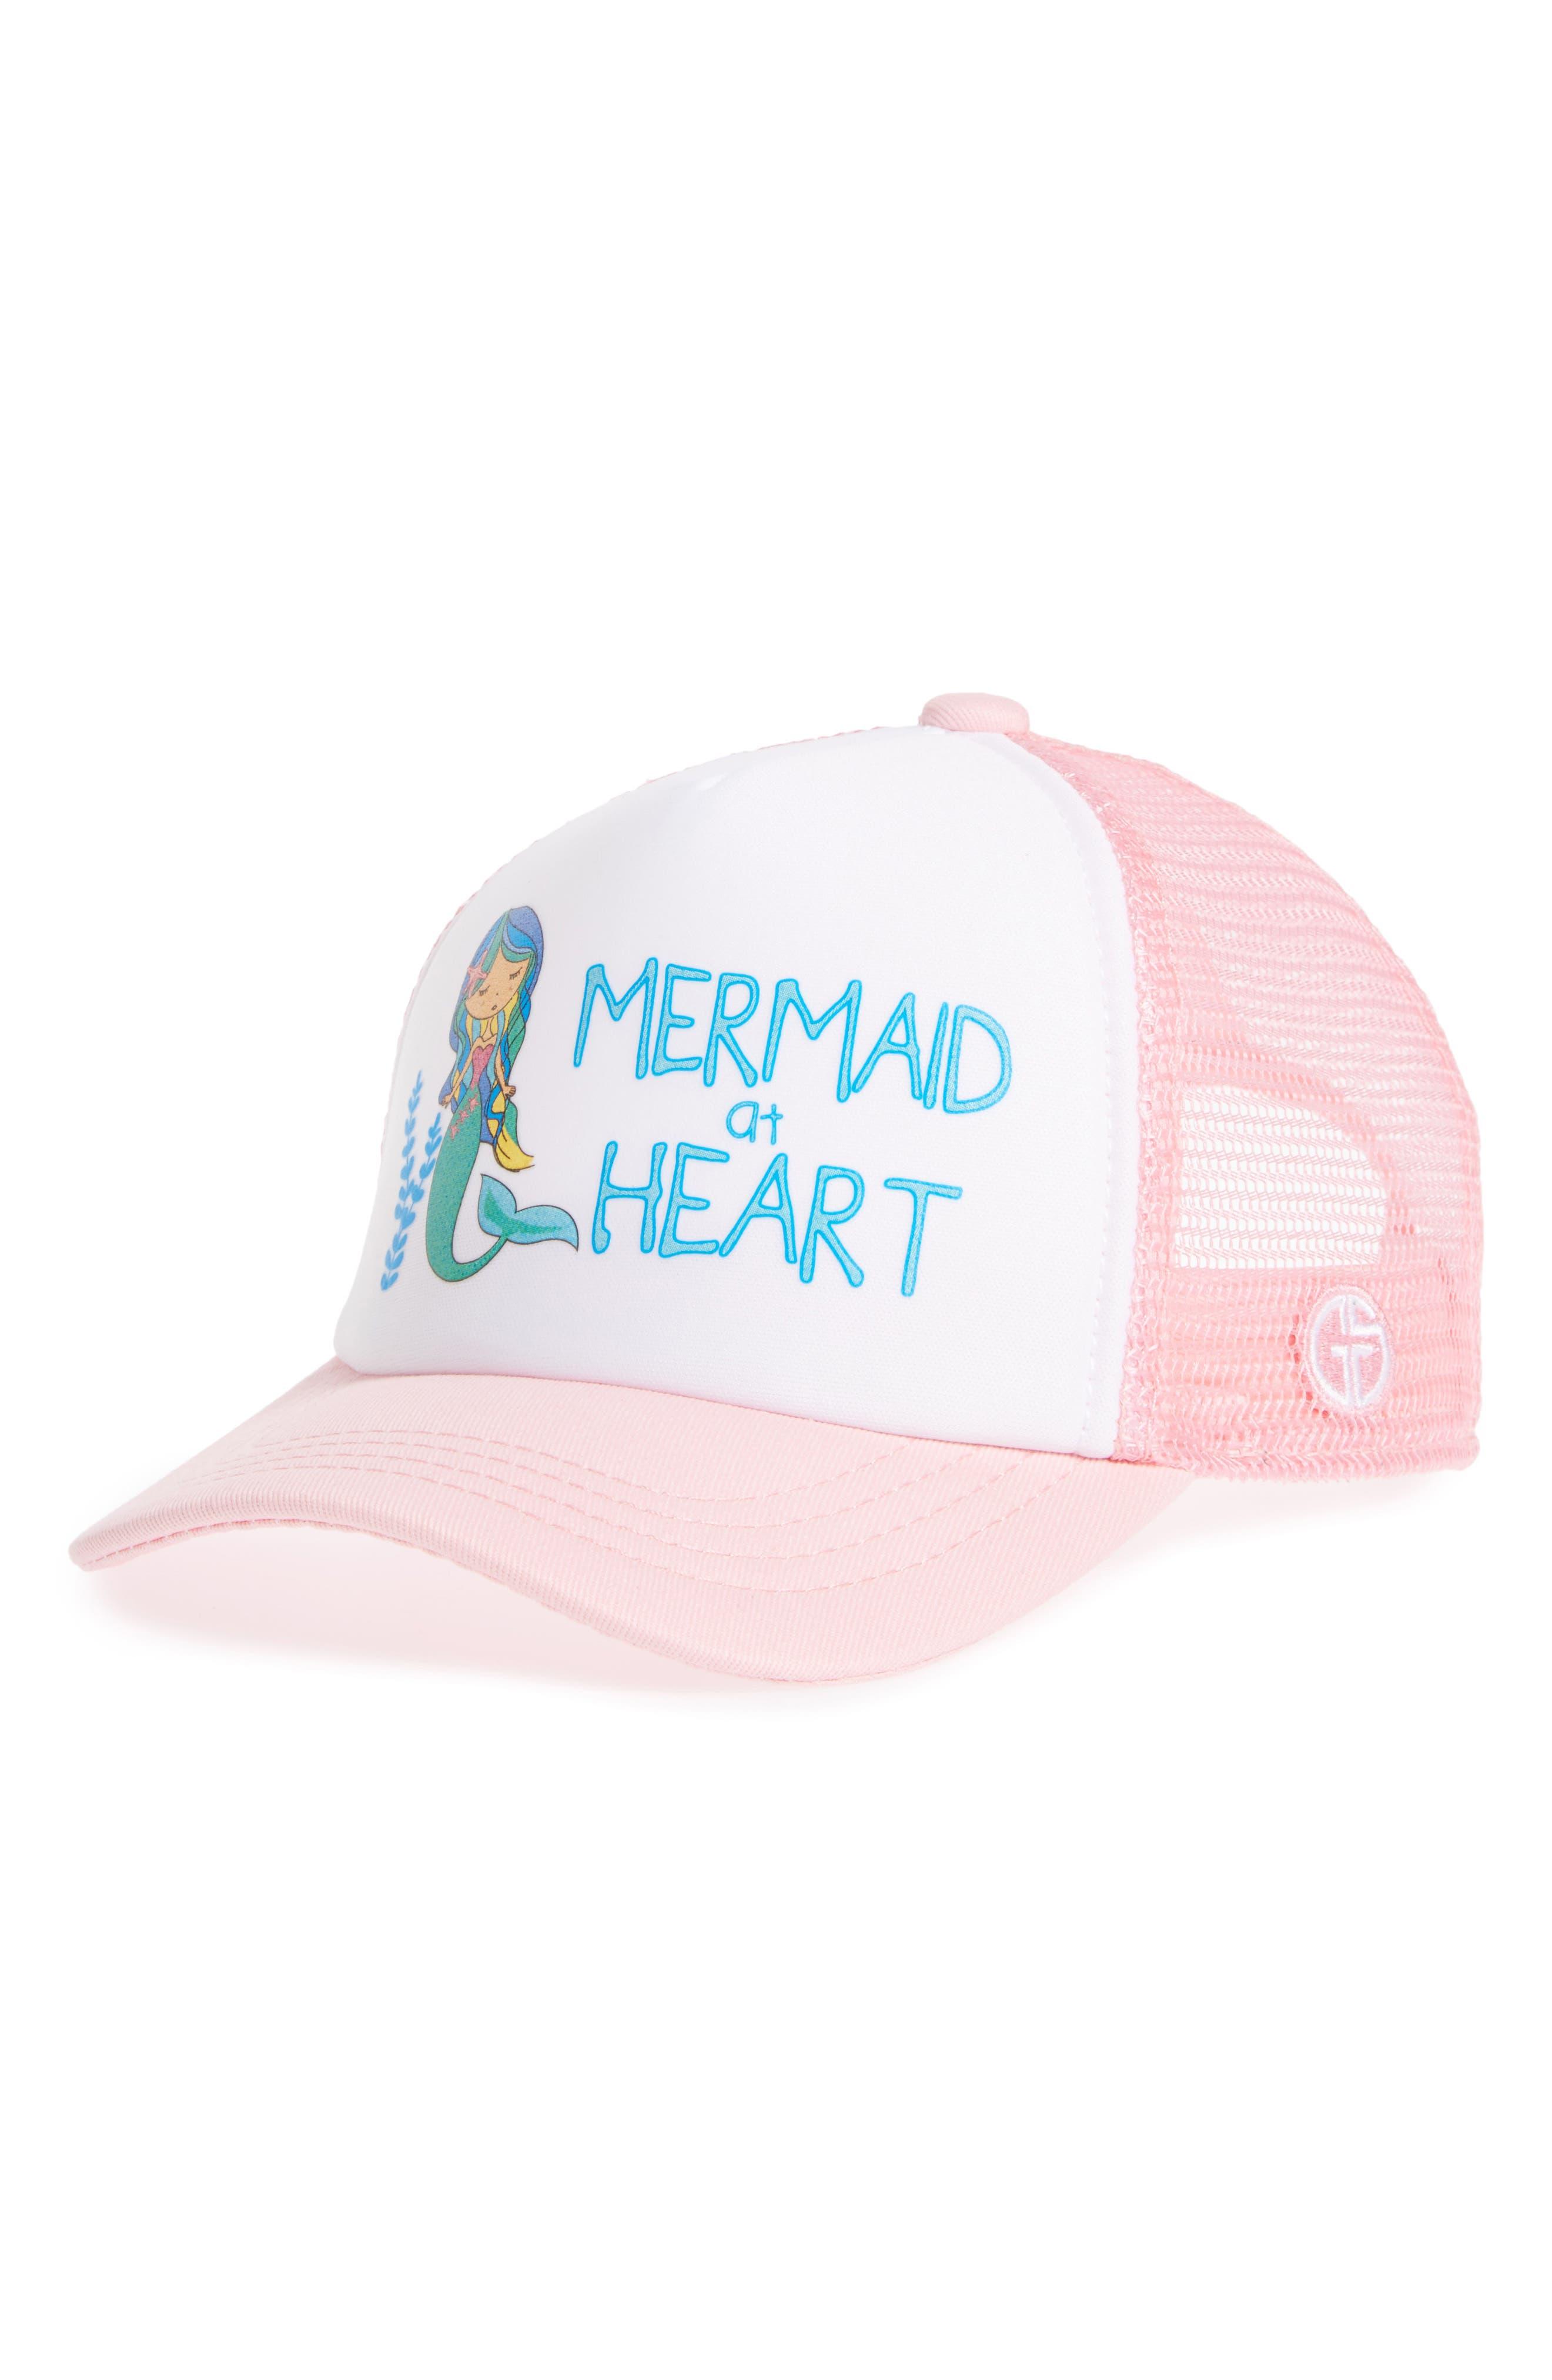 Trucker Hat,                             Main thumbnail 1, color,                             MERMAID AT HEART